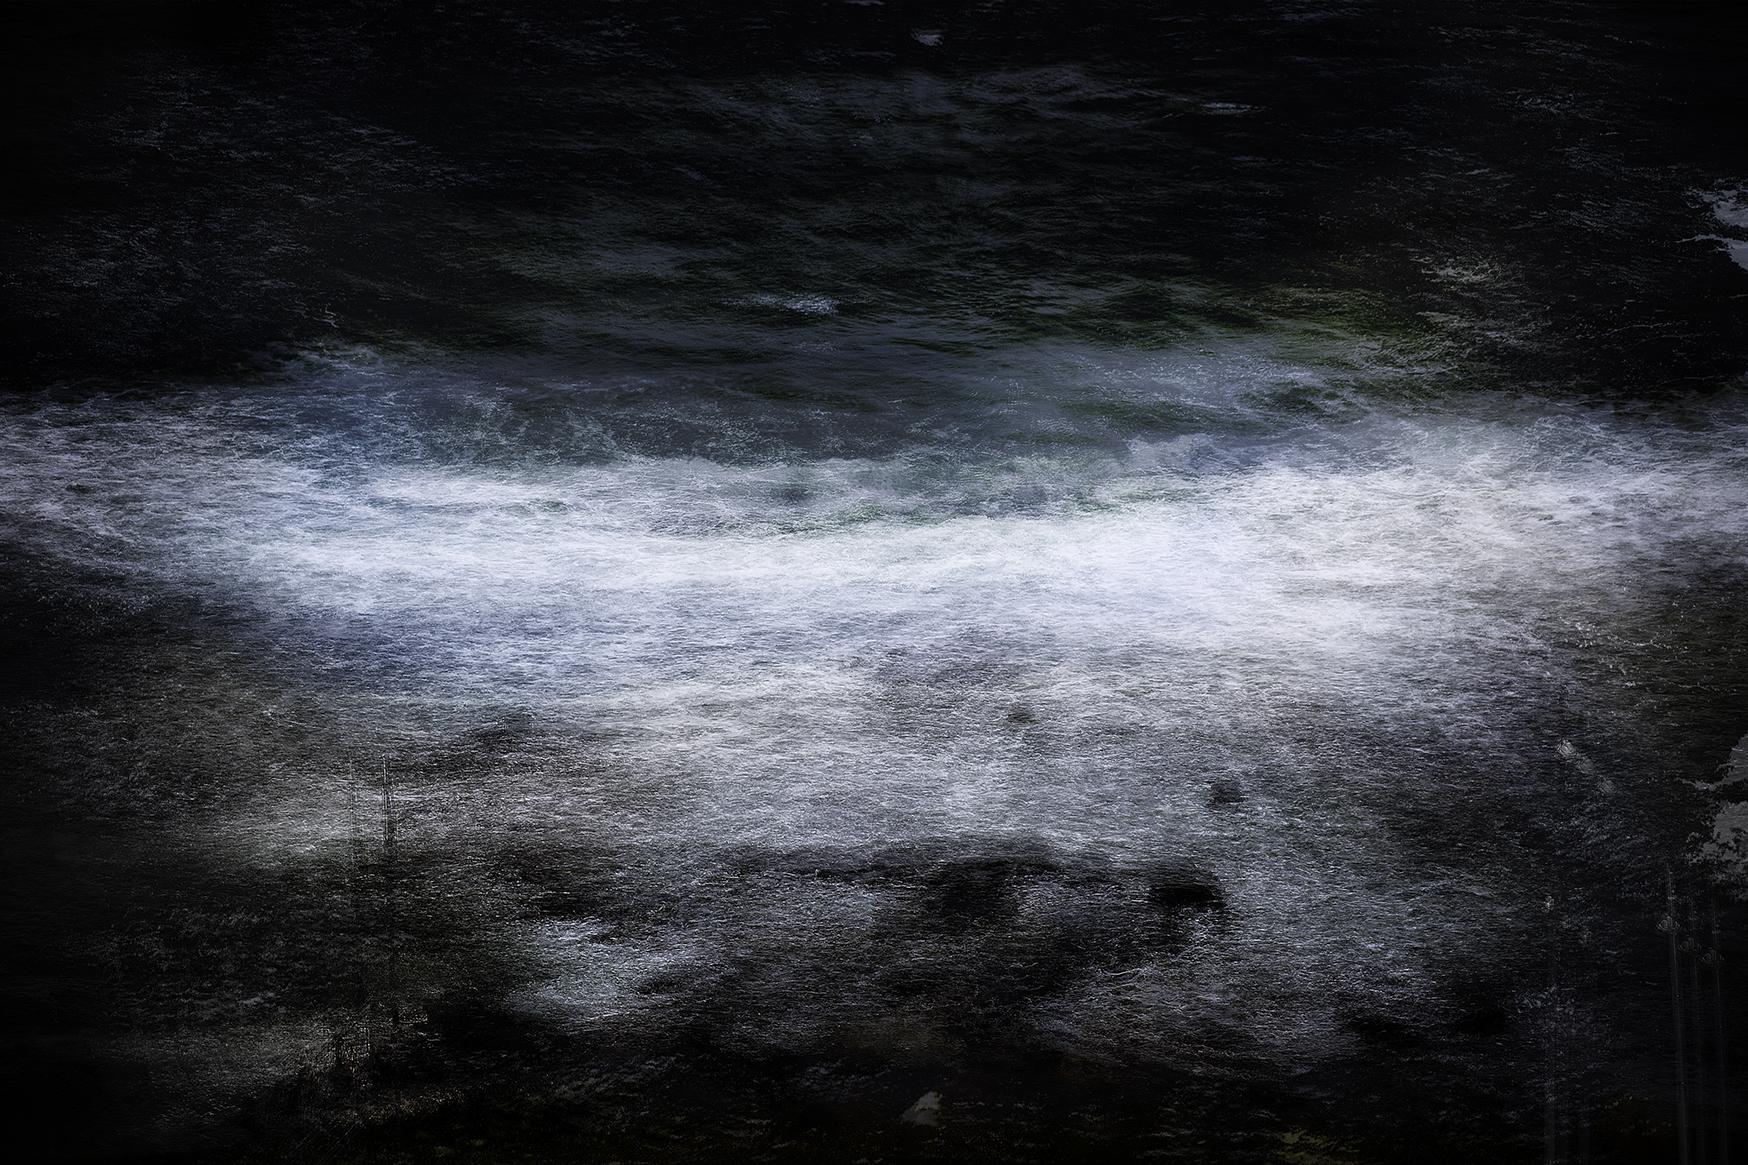 MG_1599-web-Tsunami-Wave-Südafrika-2015-Jens-Christian-Wittig